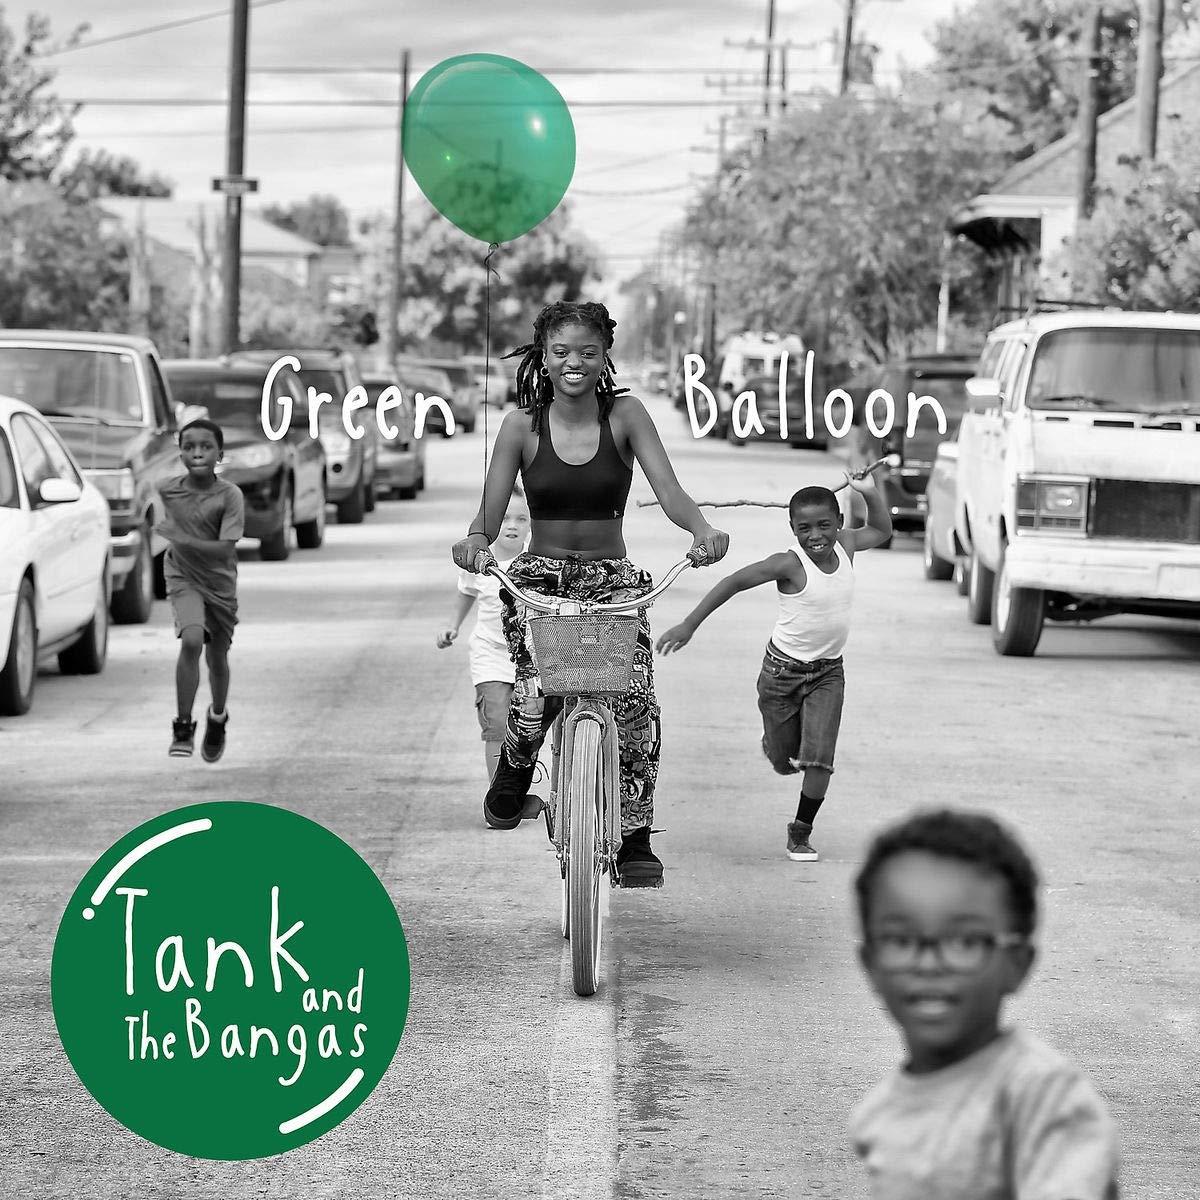 CD Shop - TANK AND THE BANGAS GREEN BALLOON